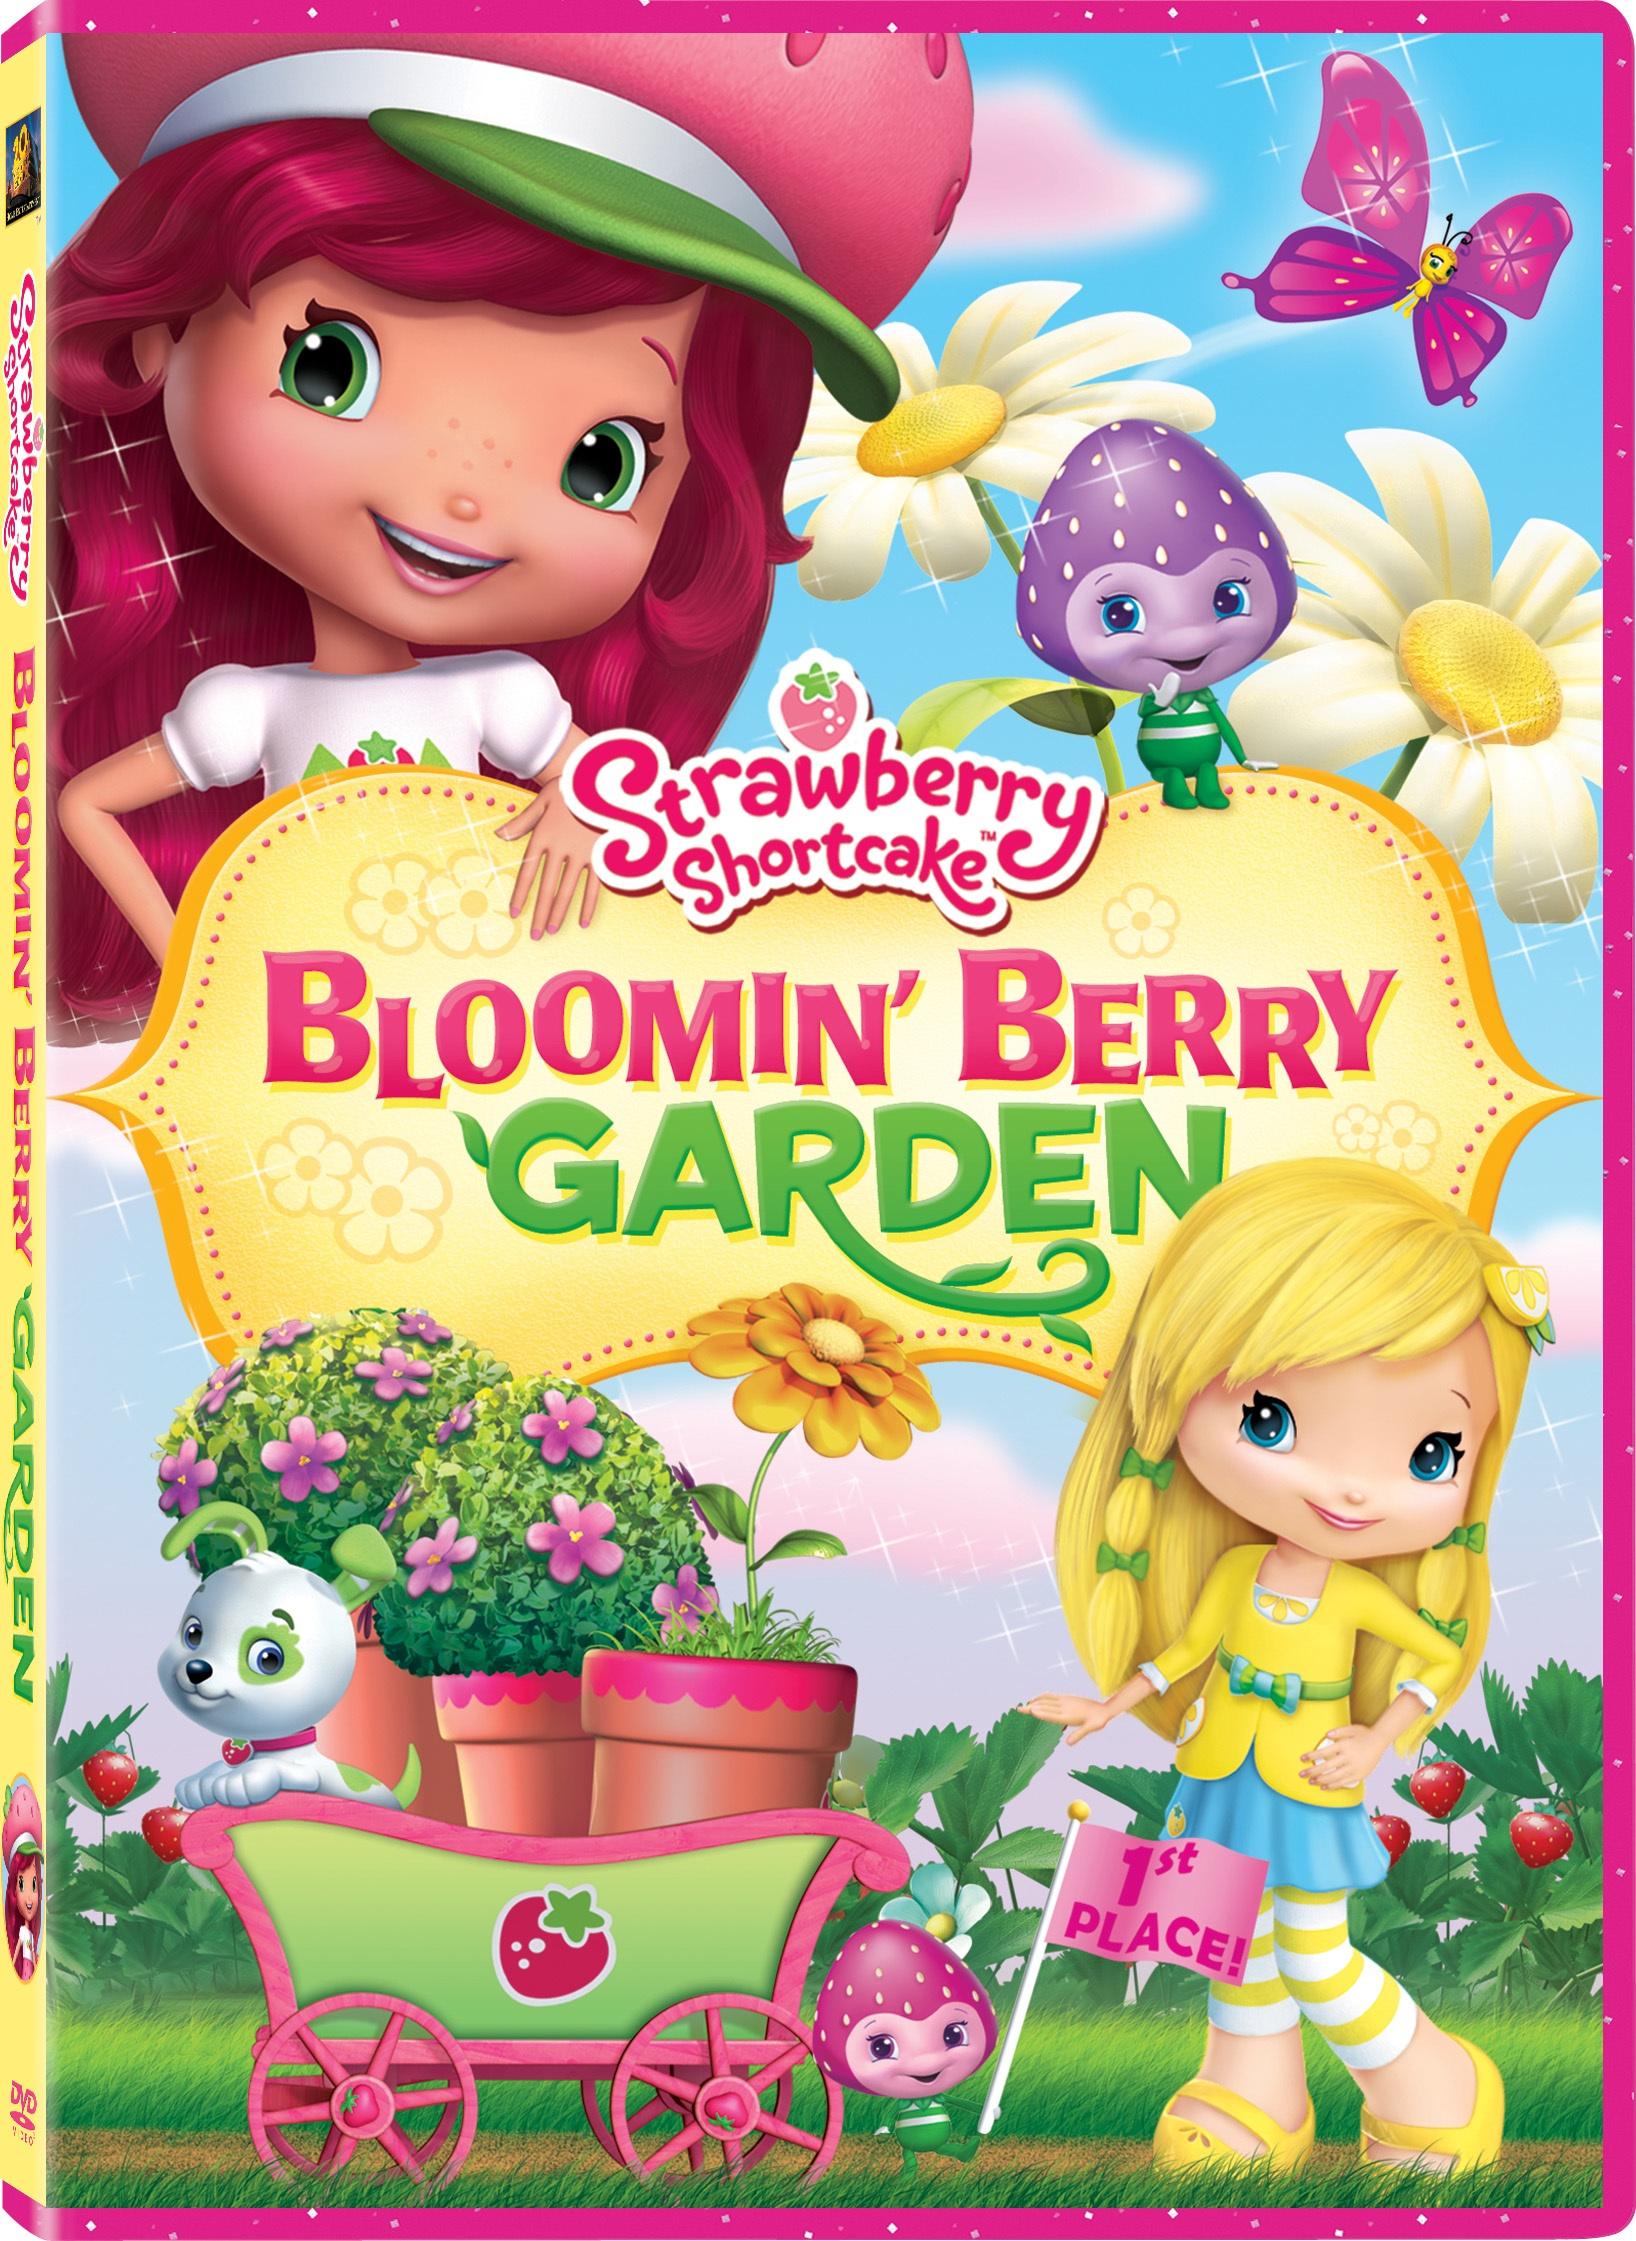 Strawberry-Shortcake-Bloomin-Berry-Garden-DVD.jpg